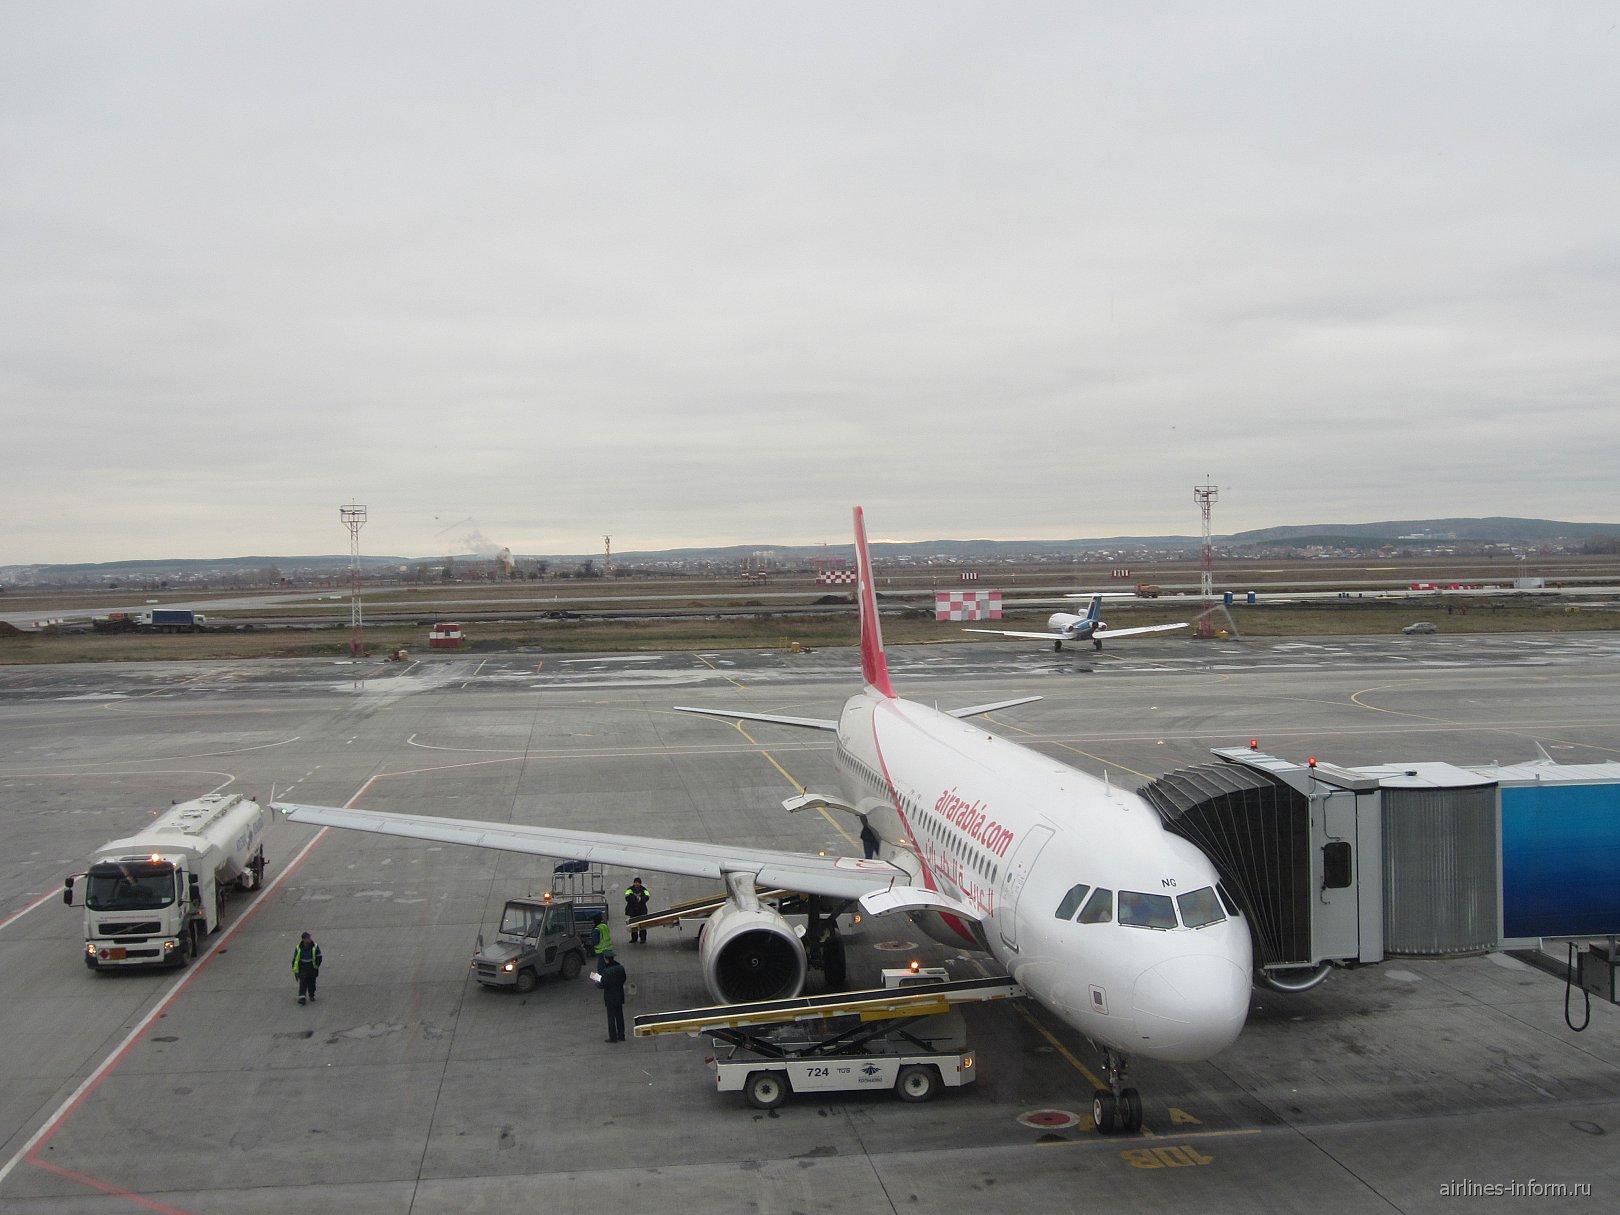 Airbus A320 авиакомпании Air Arabia в аэропорту Екатеринбурга